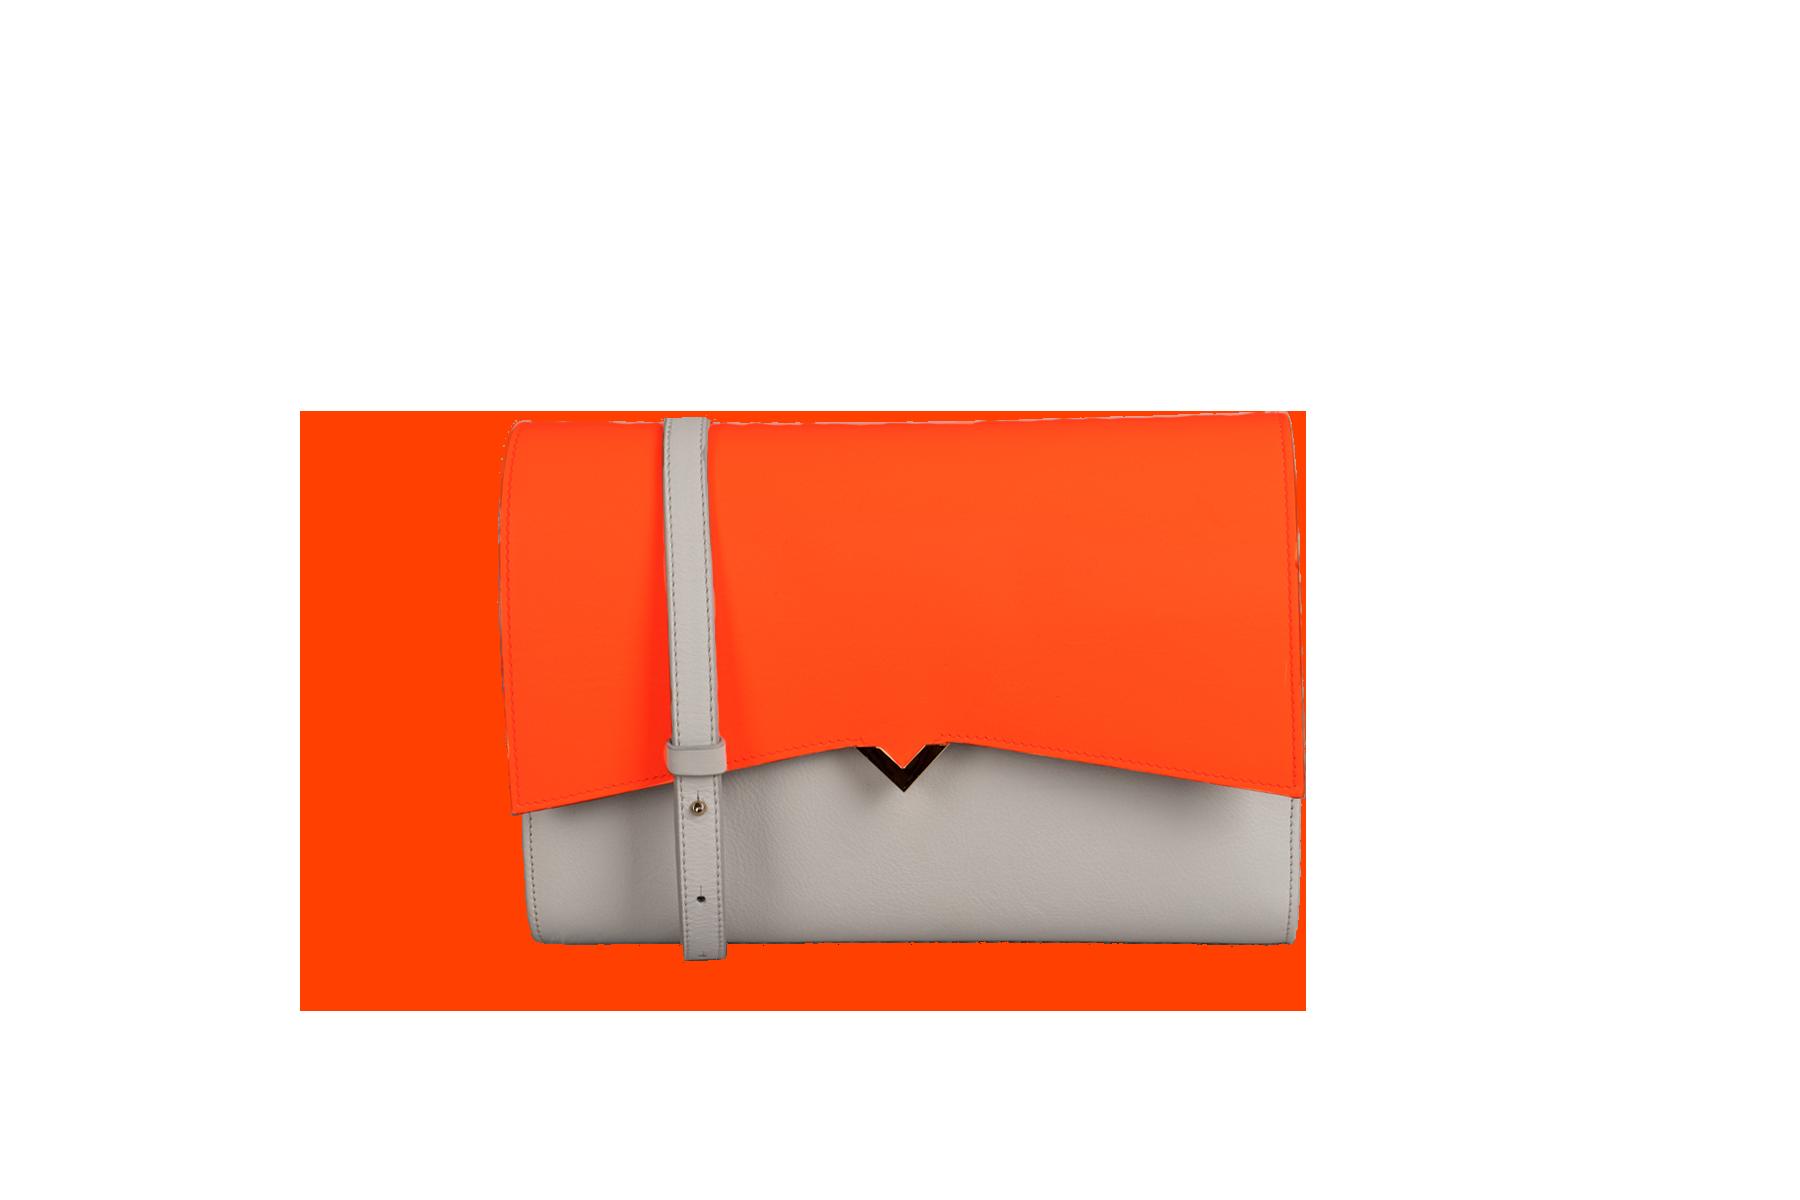 Sac Roma - Base Cuir Orange et Rabat Combinaison Cuir & Serpent